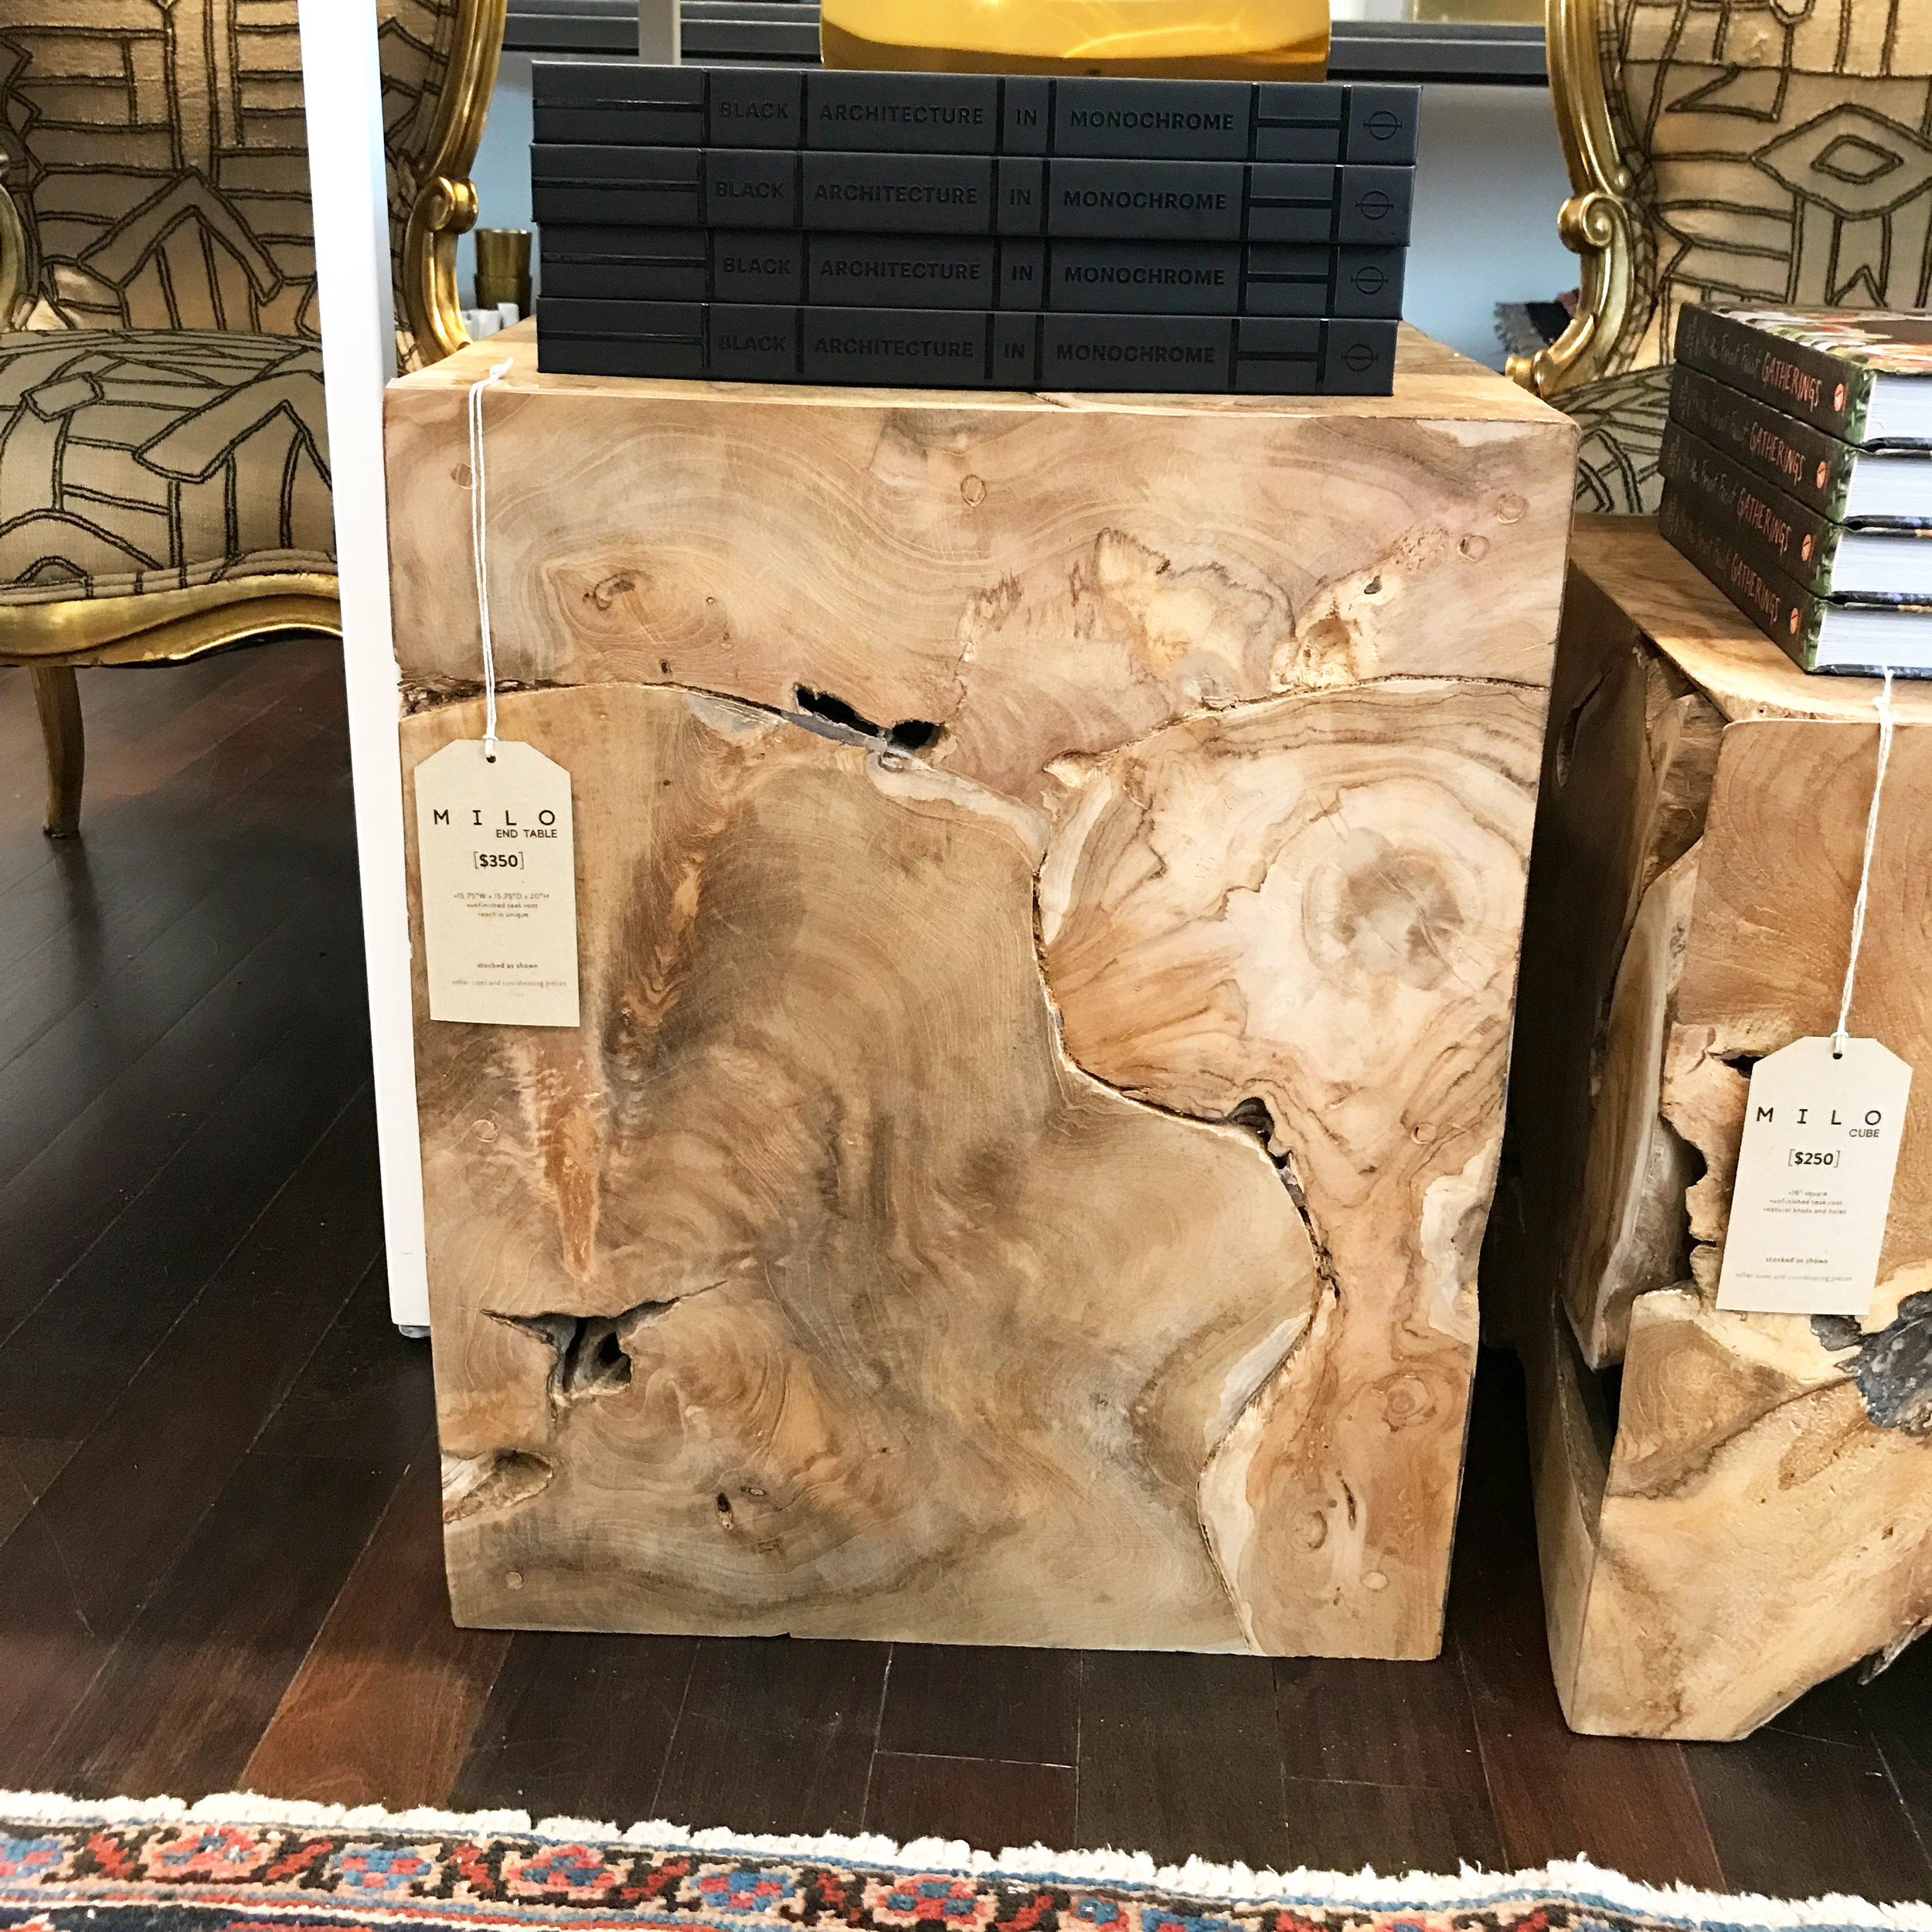 Milo Teak End Table - $350 |  GREAT FOR:  Bedside table in a modern loft bedroom